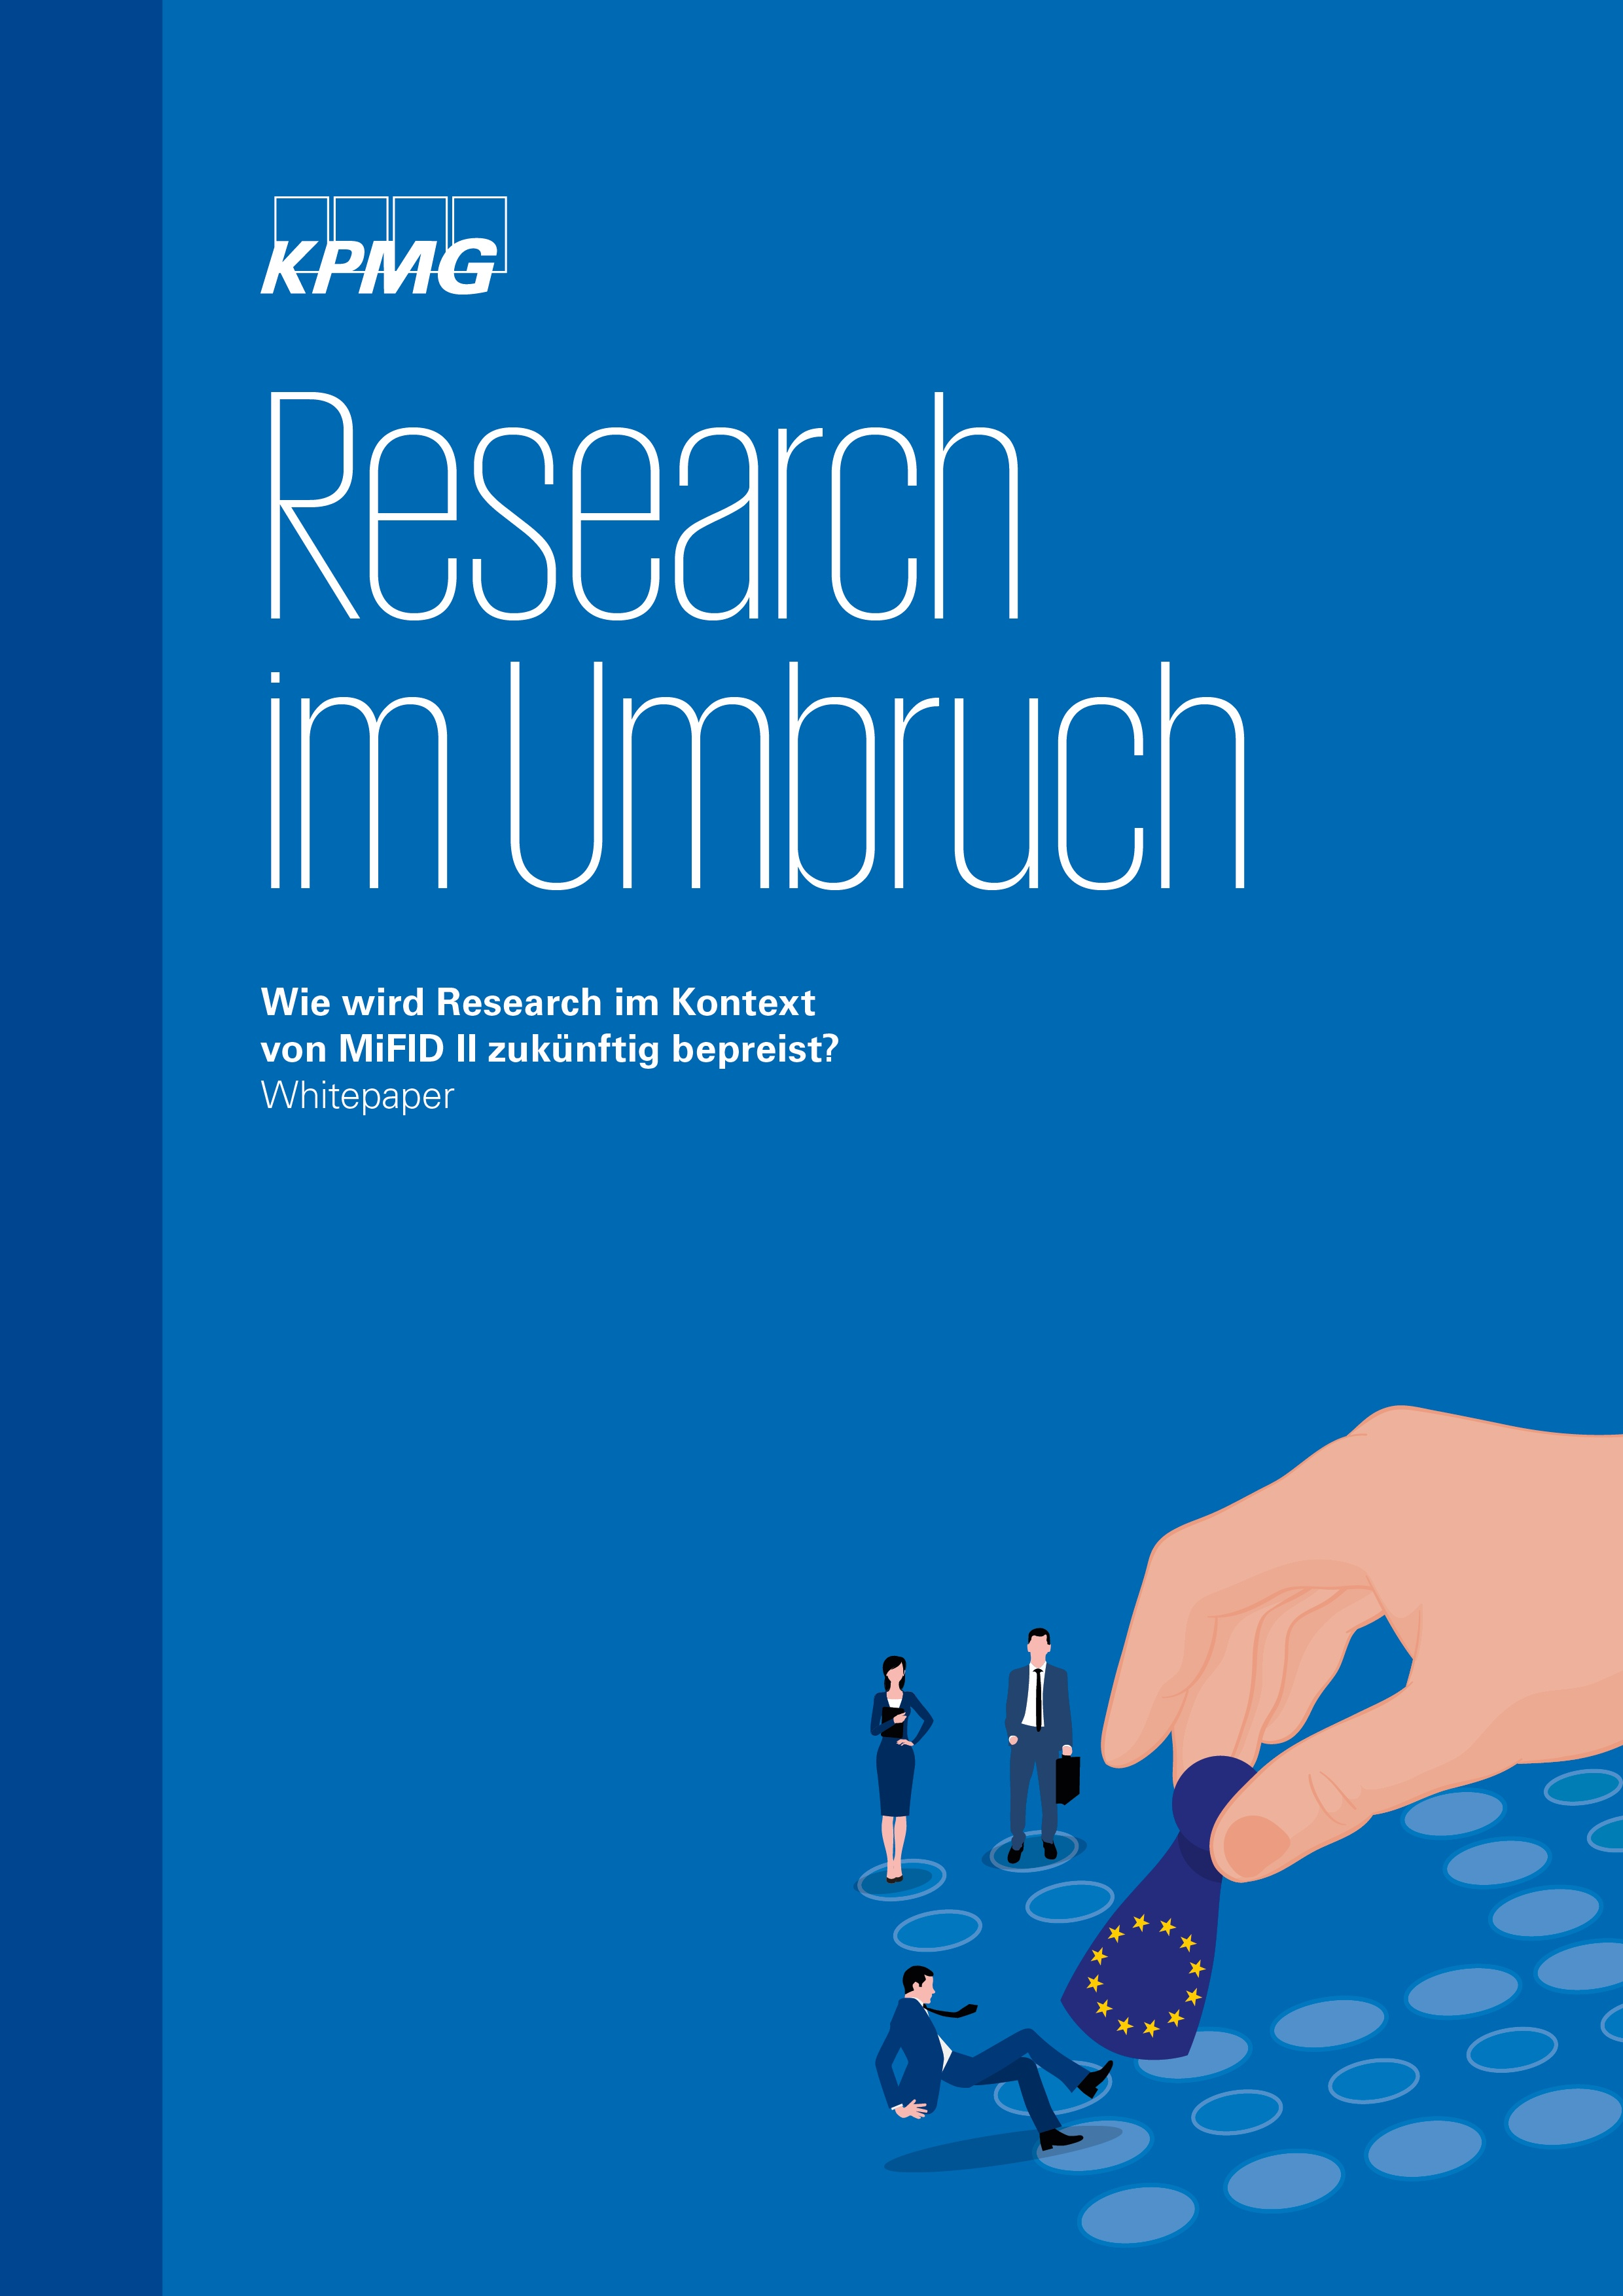 mifid2-was-dard-research-kosten-cover-2017-KPMG.jpg